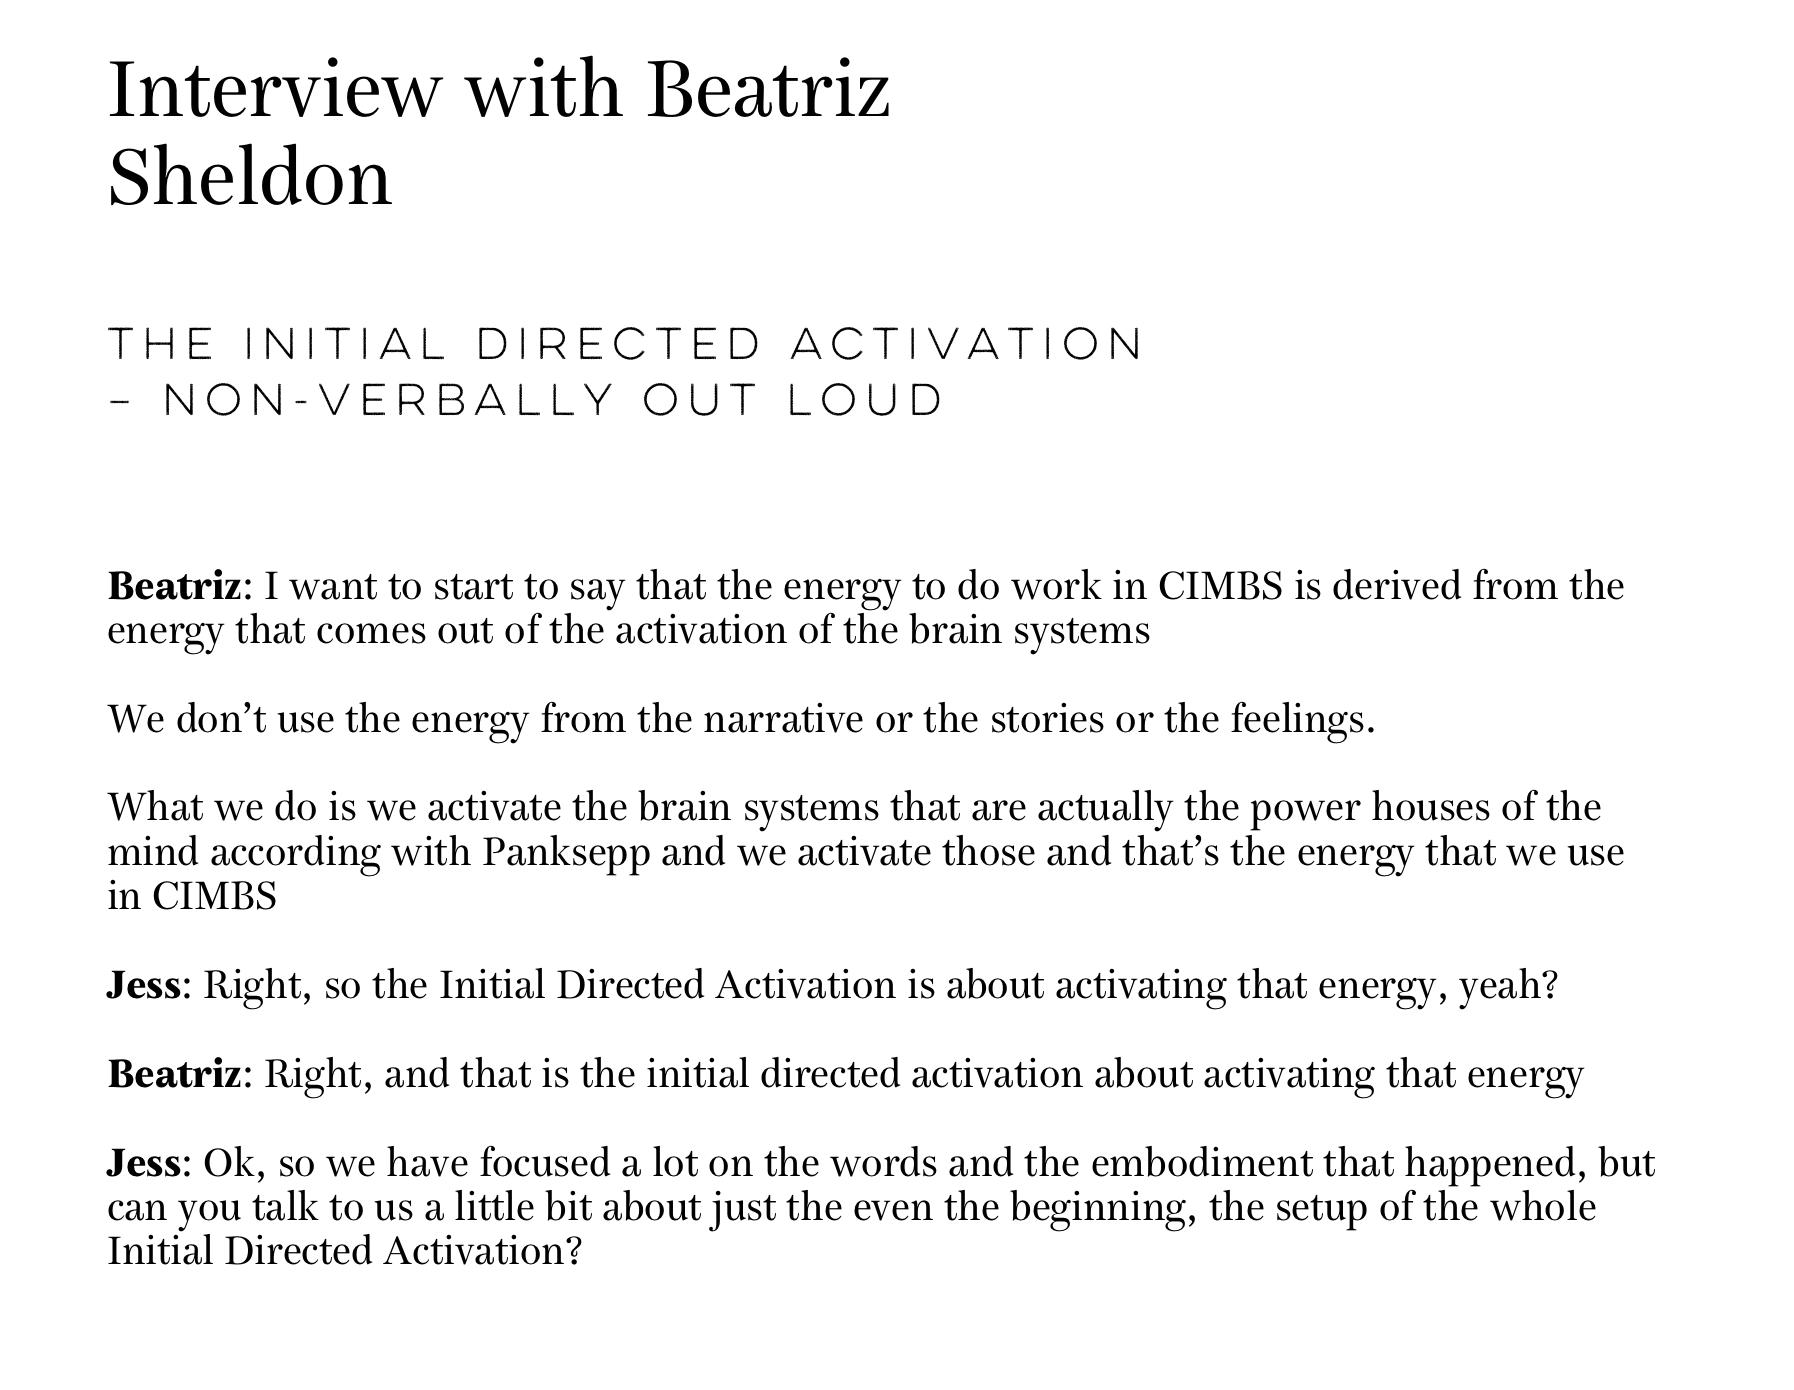 Transcript of an interview with Beatriz Sheldon